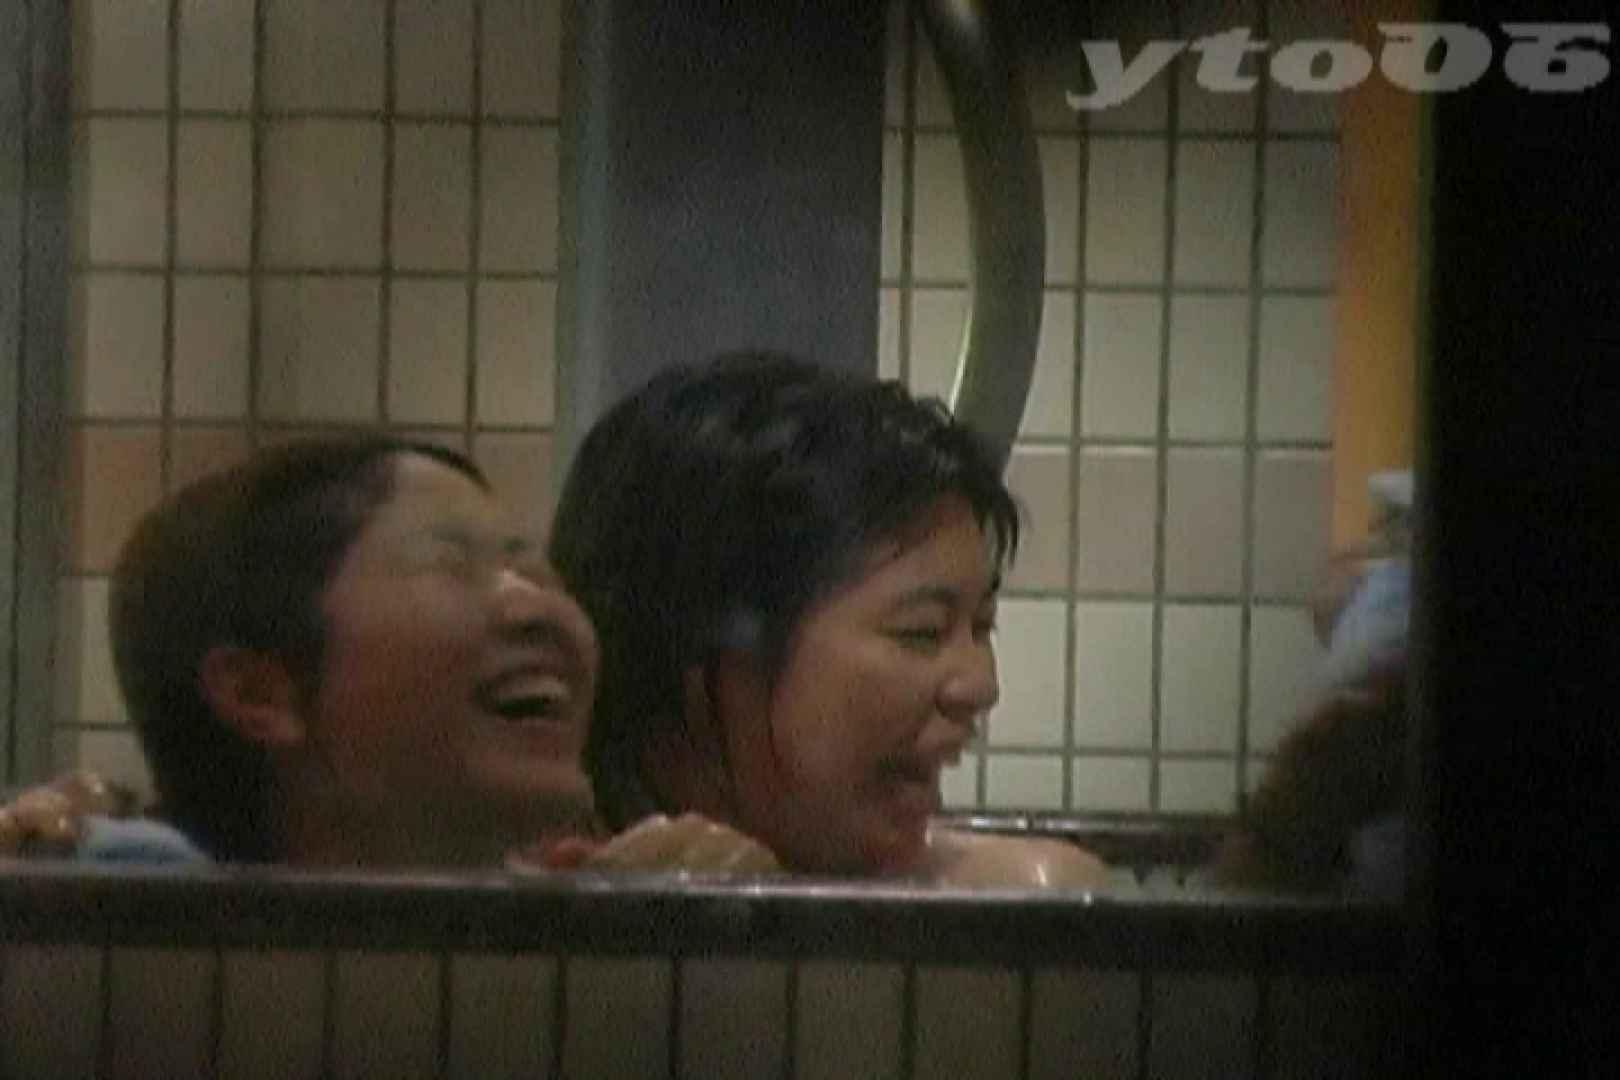 ▲復活限定▲合宿ホテル女風呂盗撮 Vol.34 合宿 ワレメ無修正動画無料 107枚 15